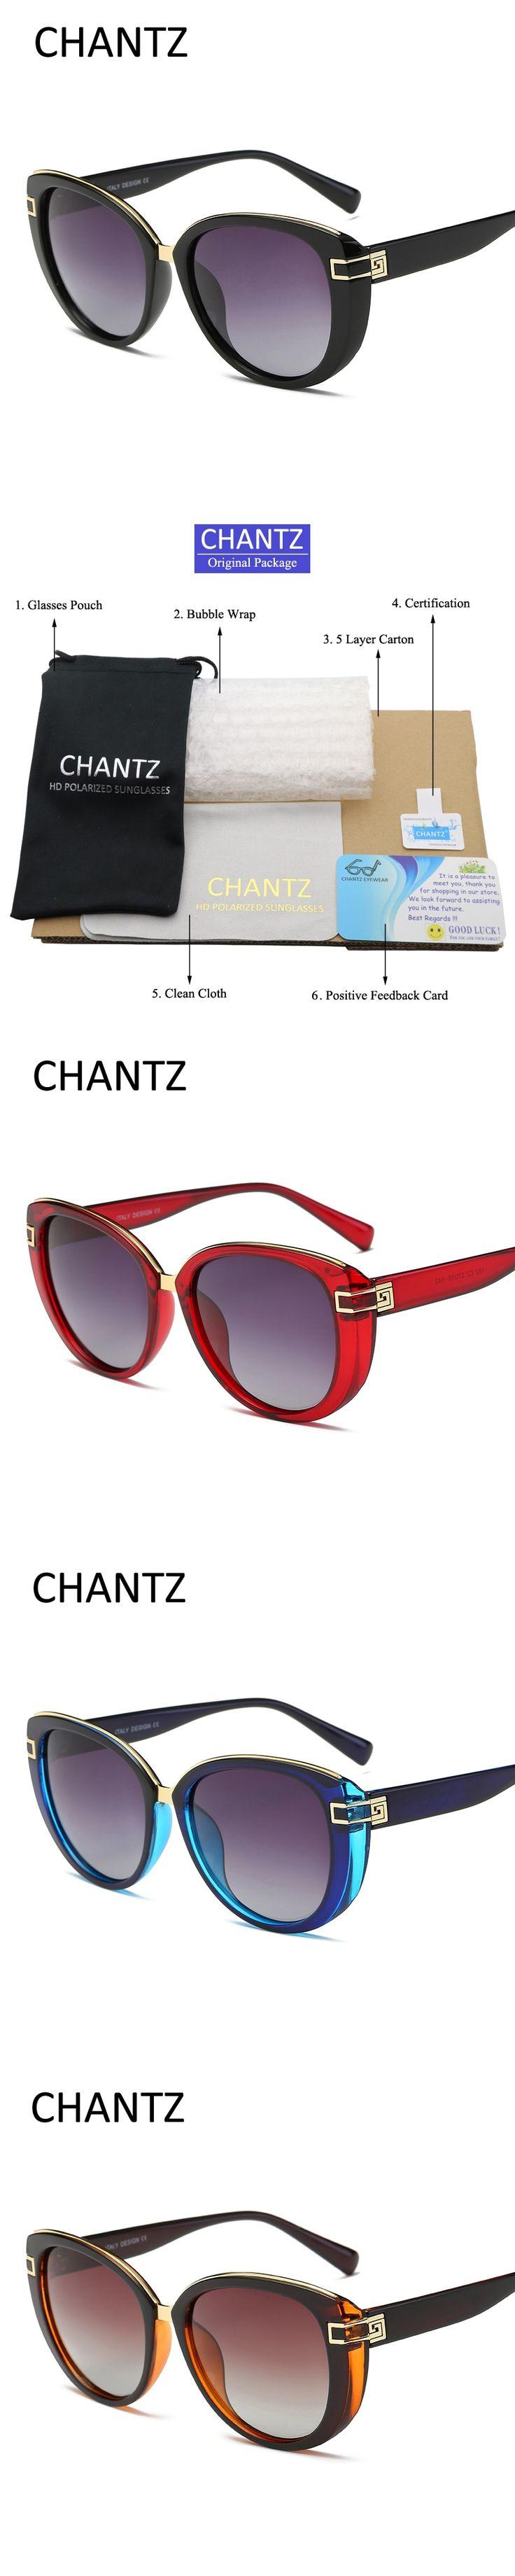 Top Quality Cat Eye Sunglasses Women Polarized Sun Glasses Vintage Round Female Shades Fashion UV400 Oculos De Sol Feminino